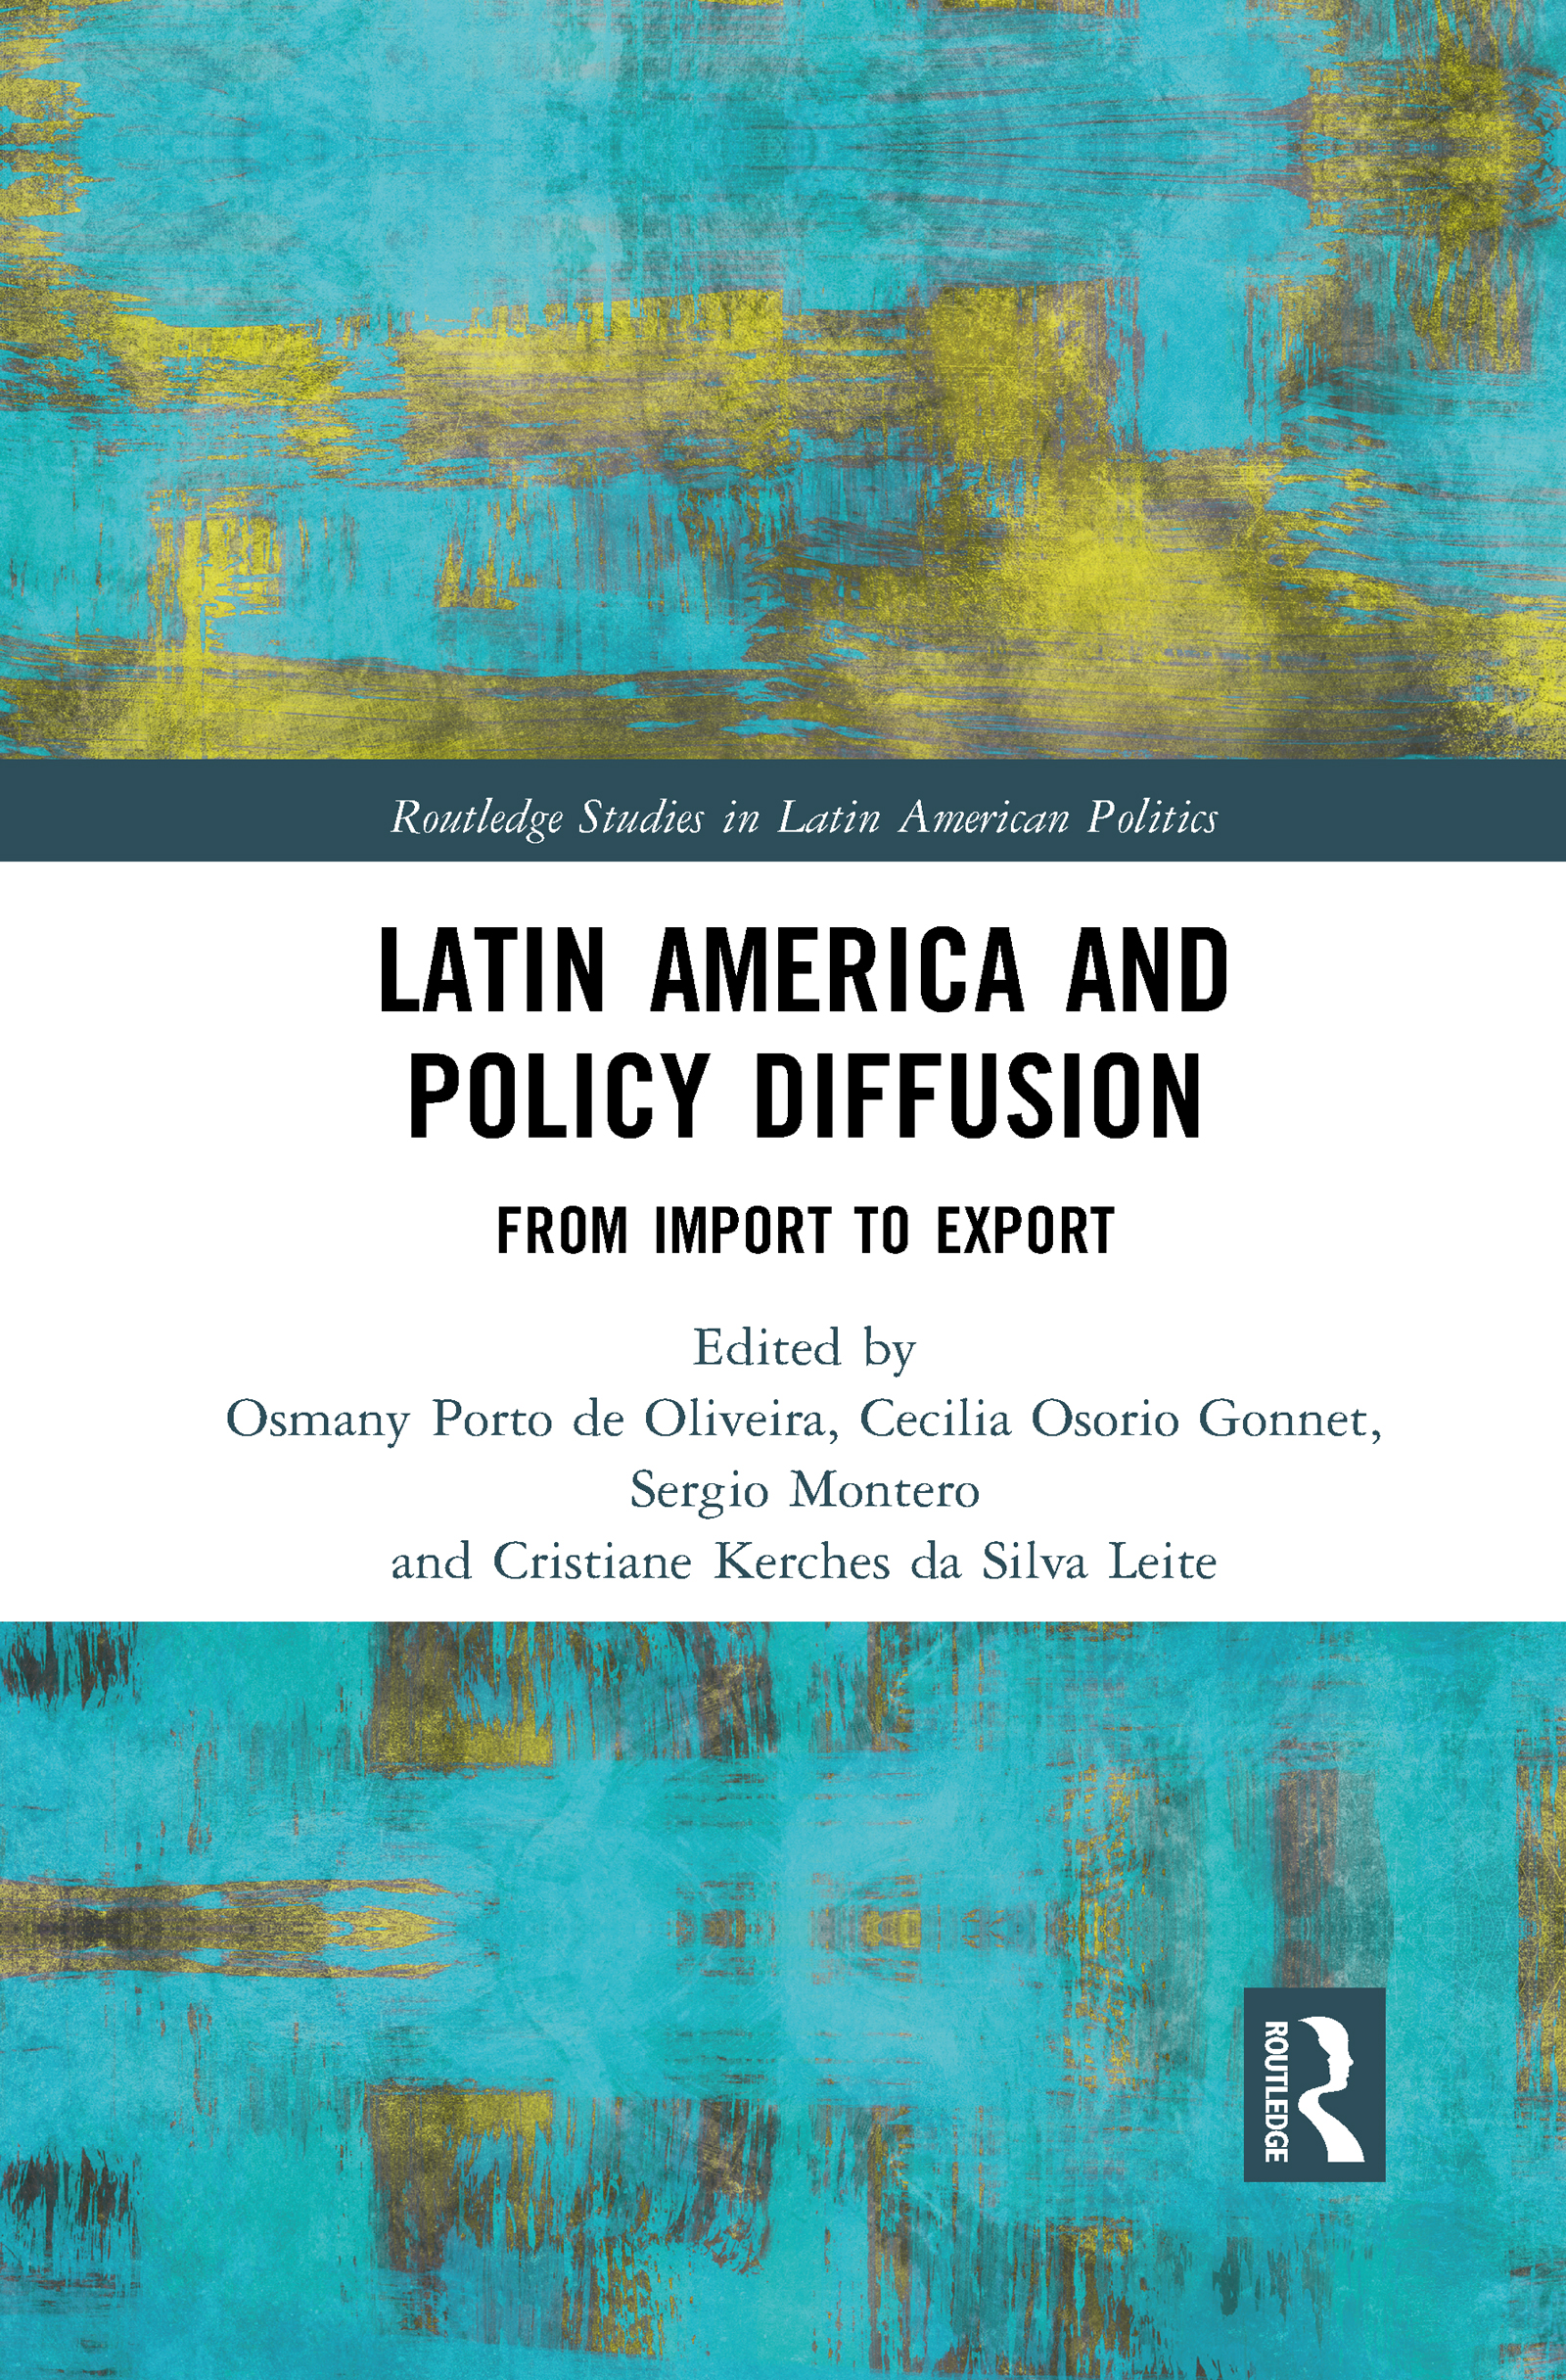 Latin America and Policy Diffusion